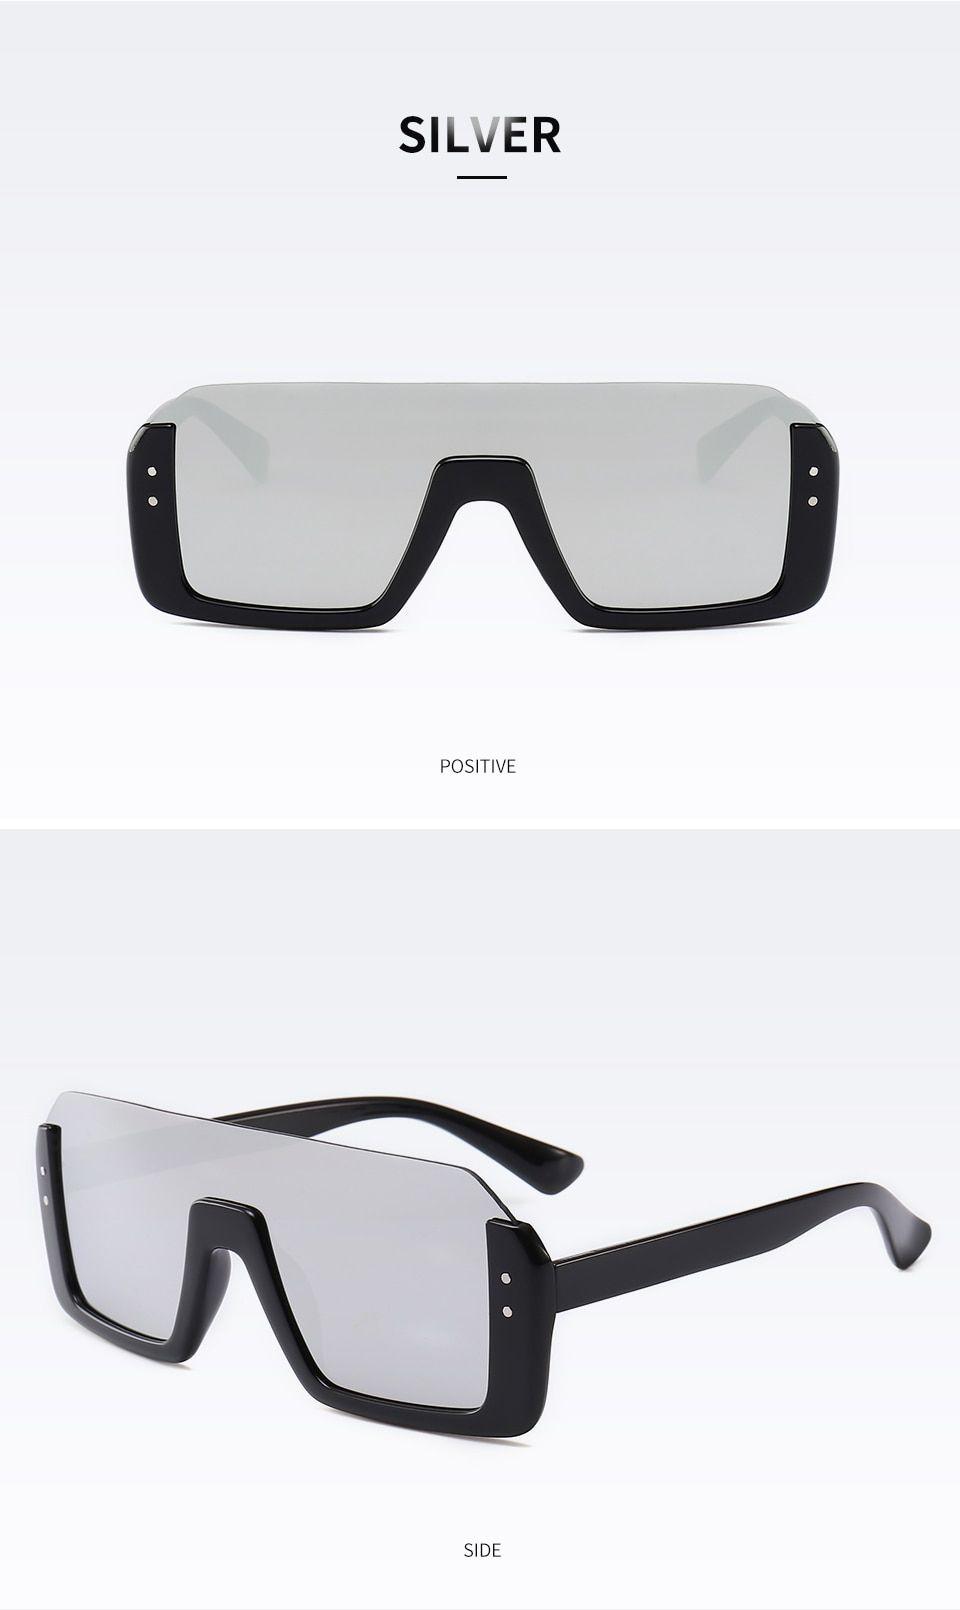 3b7c266850 2019 New Fashion Semi Rimless Sunglasses Men Women Retro Half Frame Sun Glasses  Mirror Coating Lens Lenses Oculos Sol Flat Top-in Sunglasses from Apparel  ...